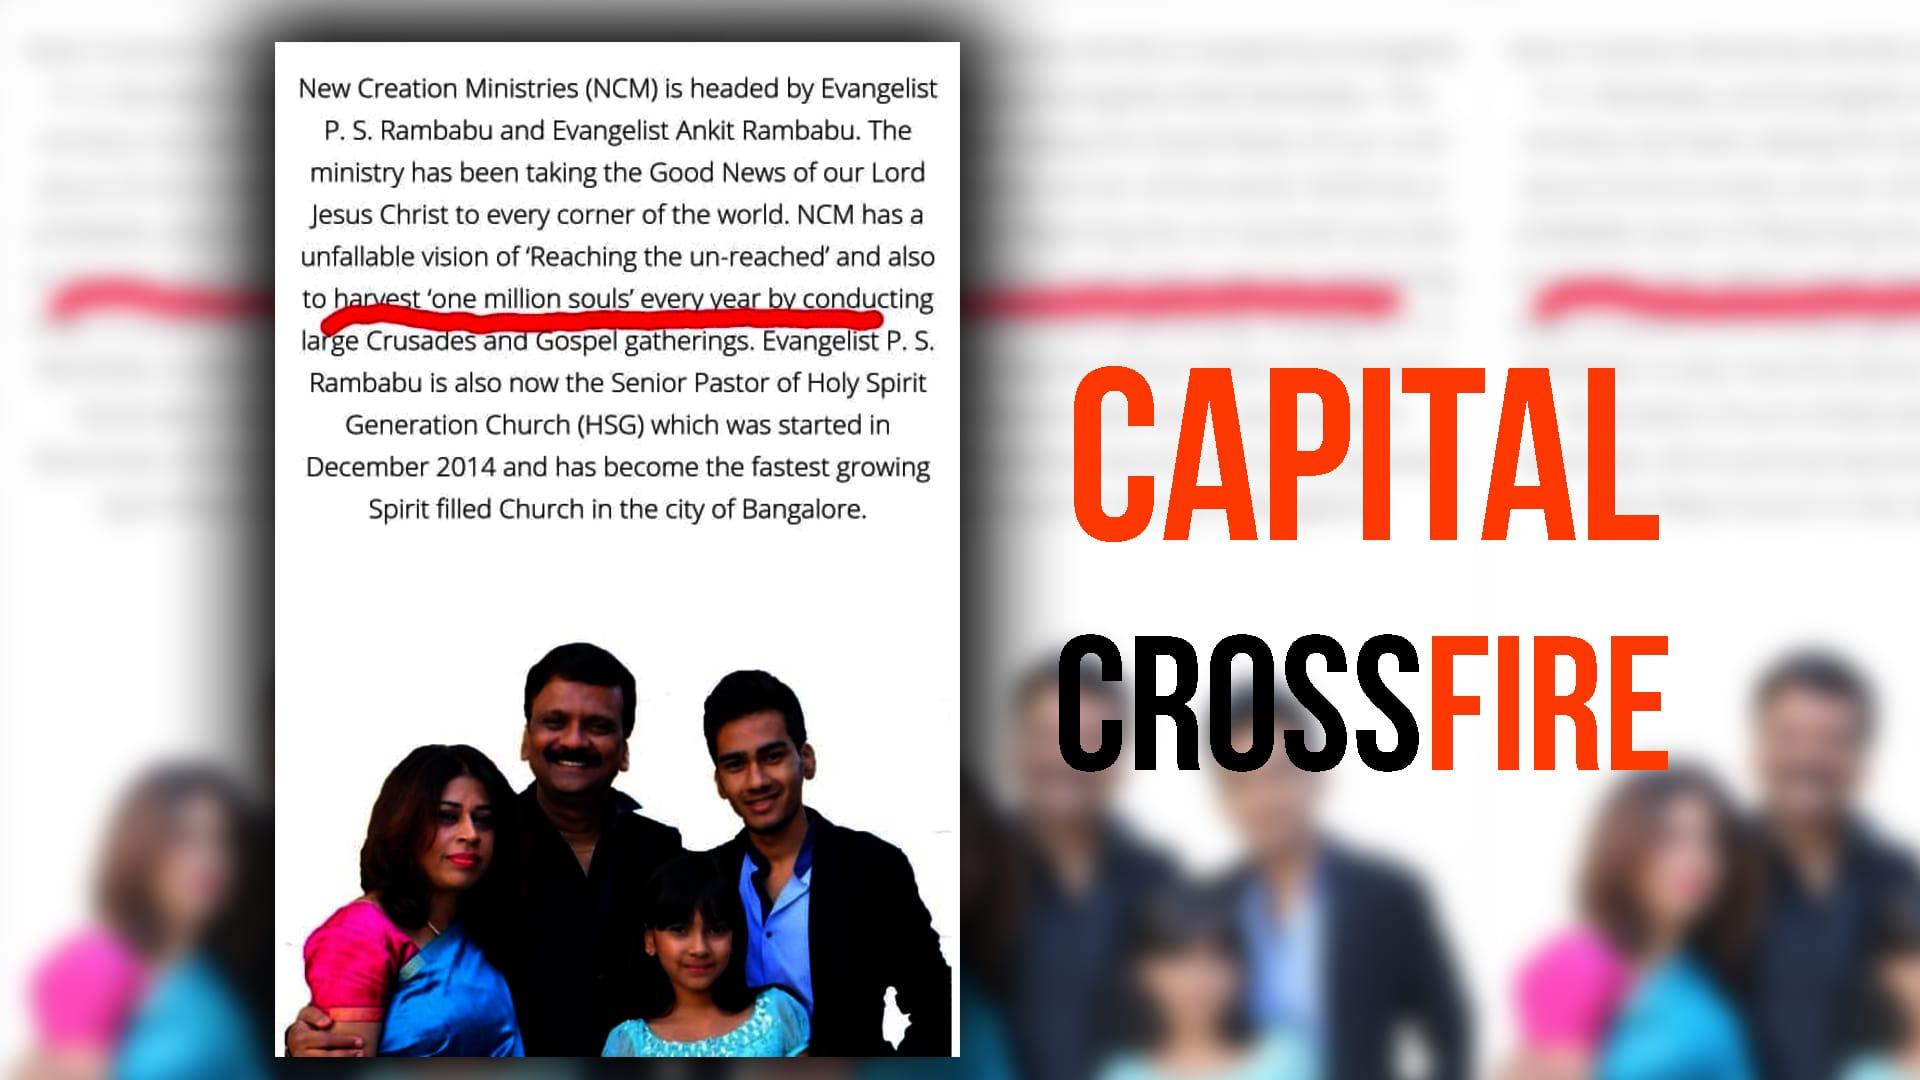 christian evangelist conversion manish sisodia aap soul harvesting delhi